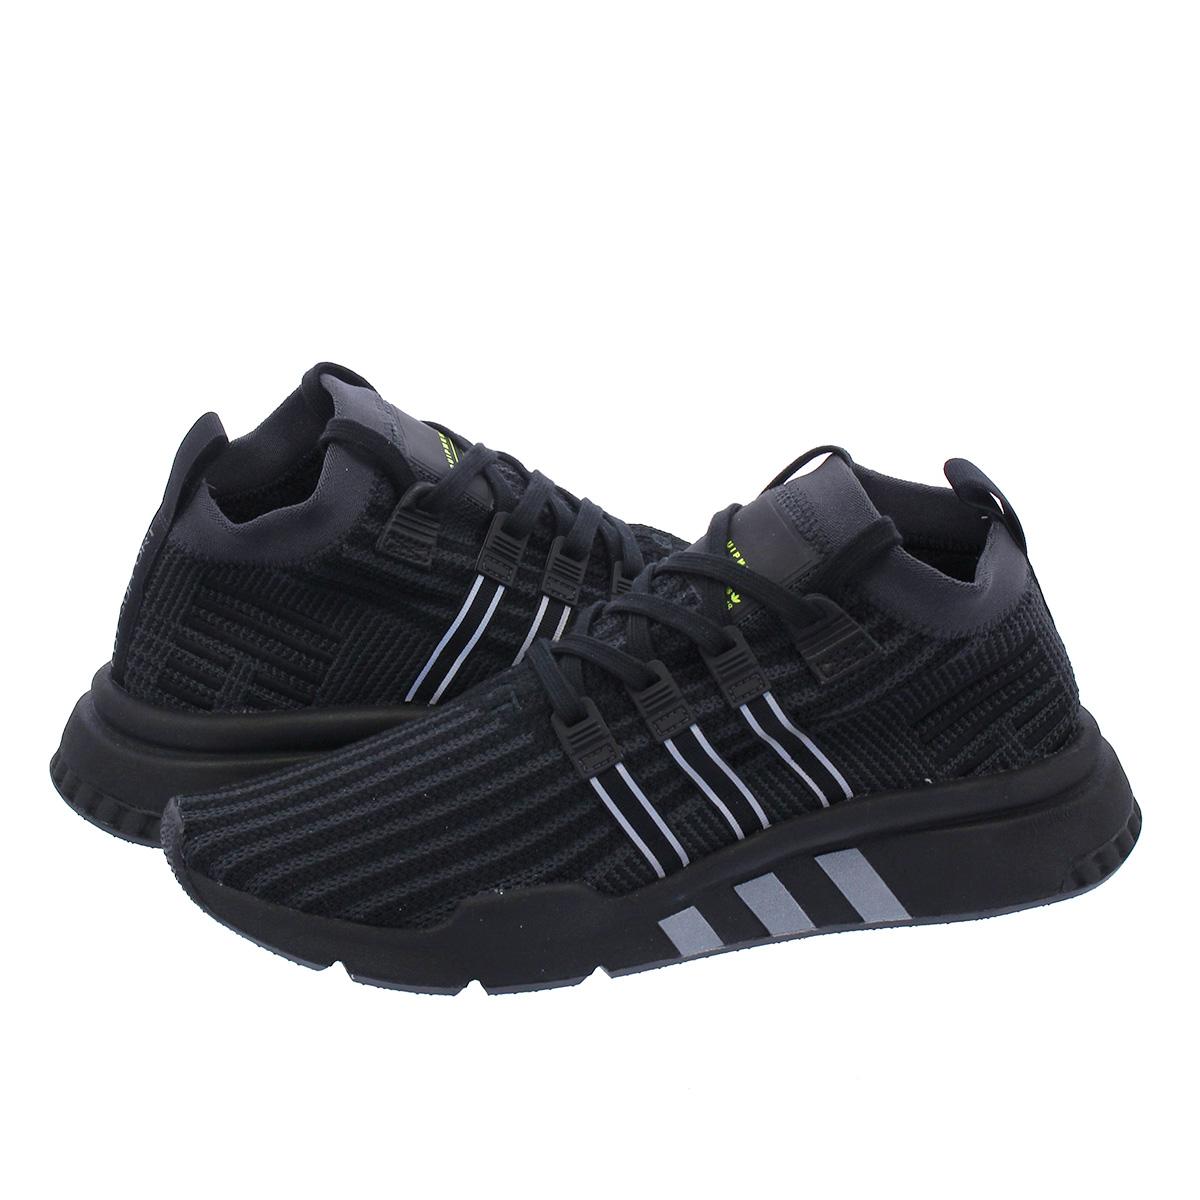 buy online f4ceb 4ec5b adidas EQT SUPPORT MID ADV PK Adidas EQT support mid ADV PK CORE  BLACK/CARBON/SOLAR YELLOW b37456